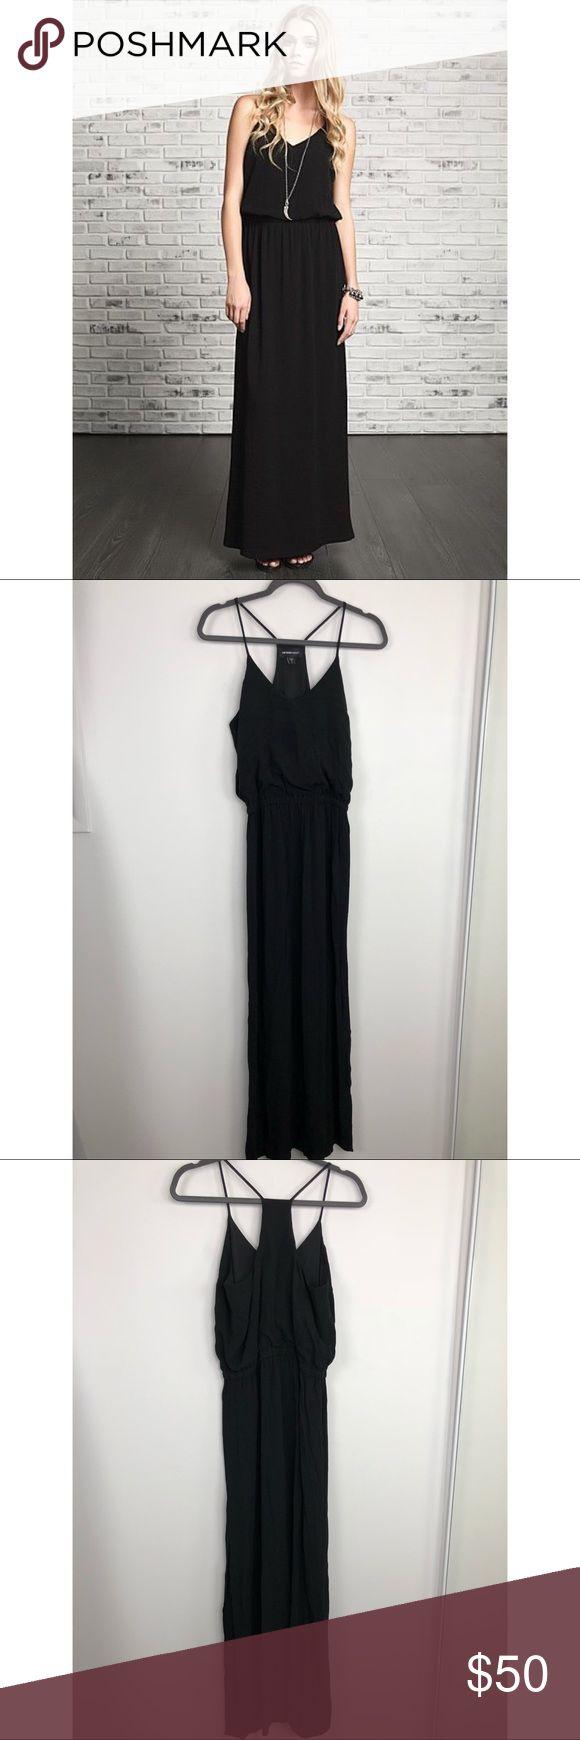 "Fifteen Twenty Black T-Back Maxi Dress Fifteen Twenty Black T-Back Maxi Dress.  Side Slit.  Approx 18"" armpit to armpit and 60"" length. Rayon.  Great condition.  D4. Fifteen Twenty Dresses Maxi"